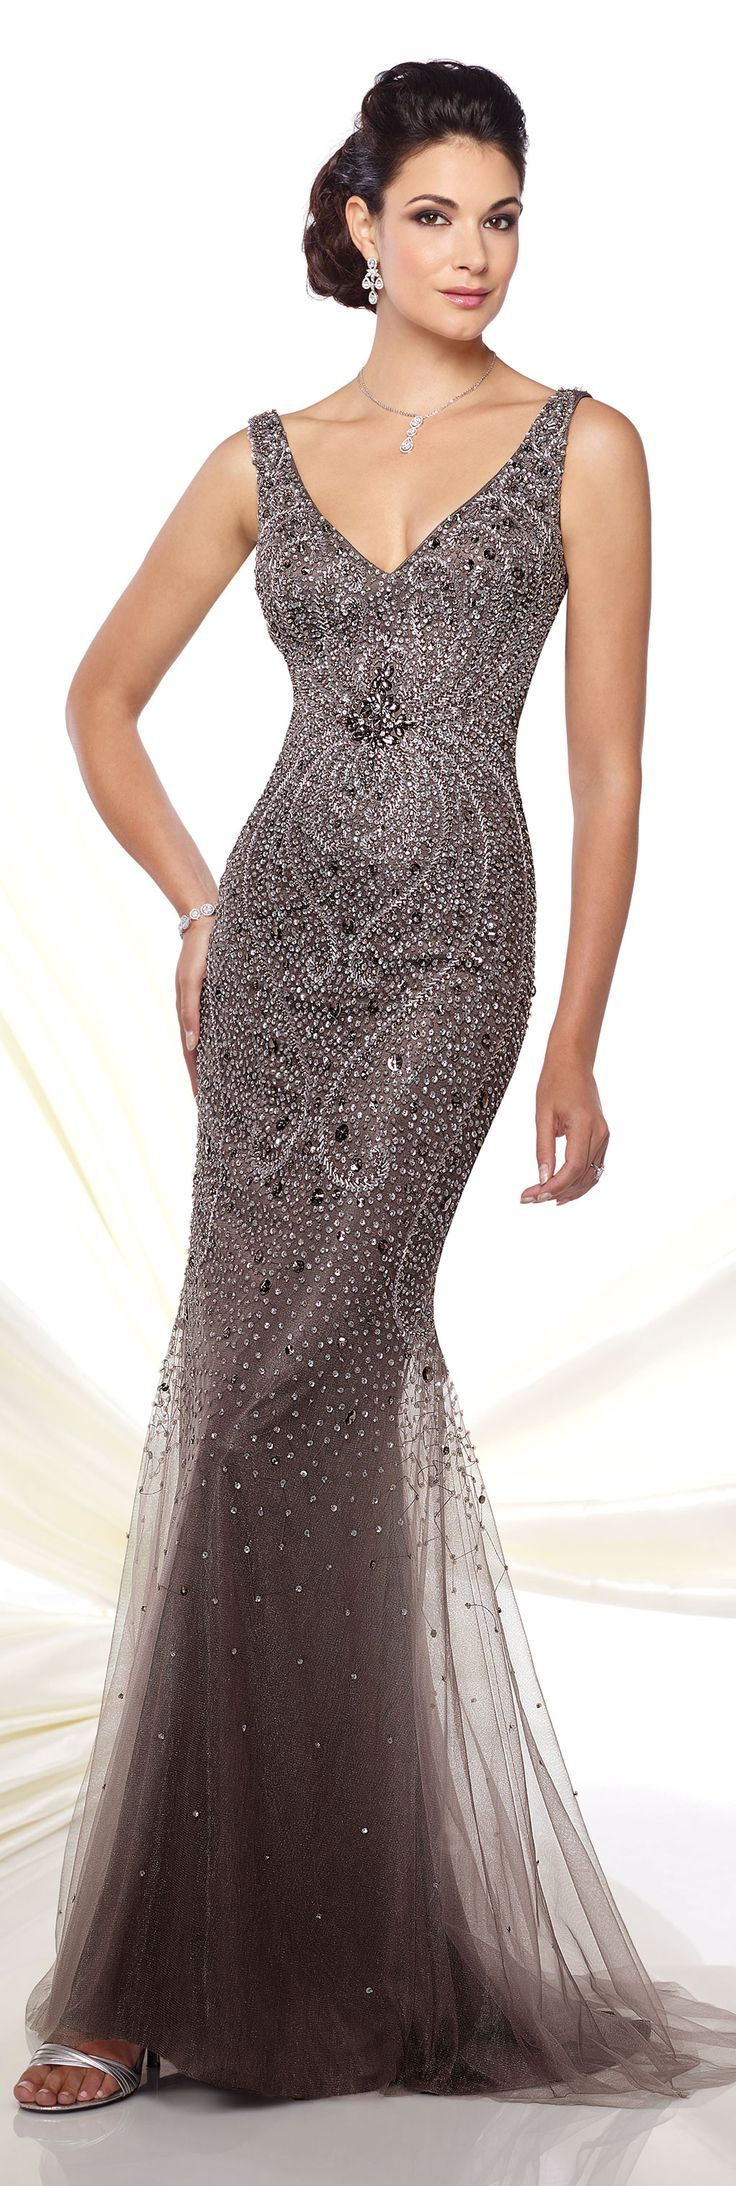 Best 25+ Evening dresses uk ideas on Pinterest